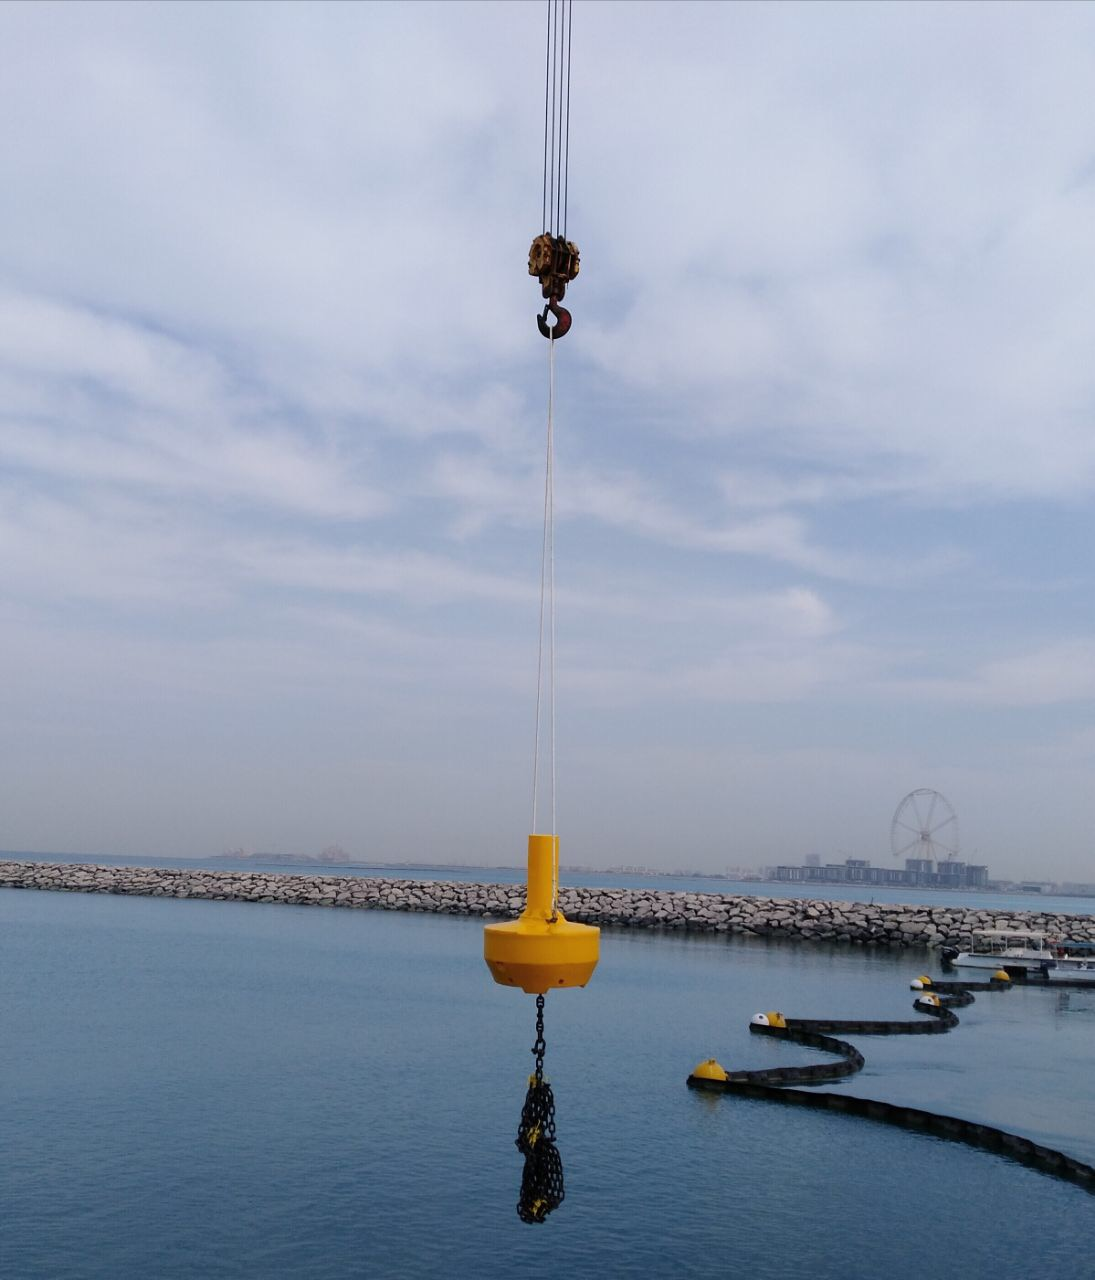 Lifting Buoy AMRO